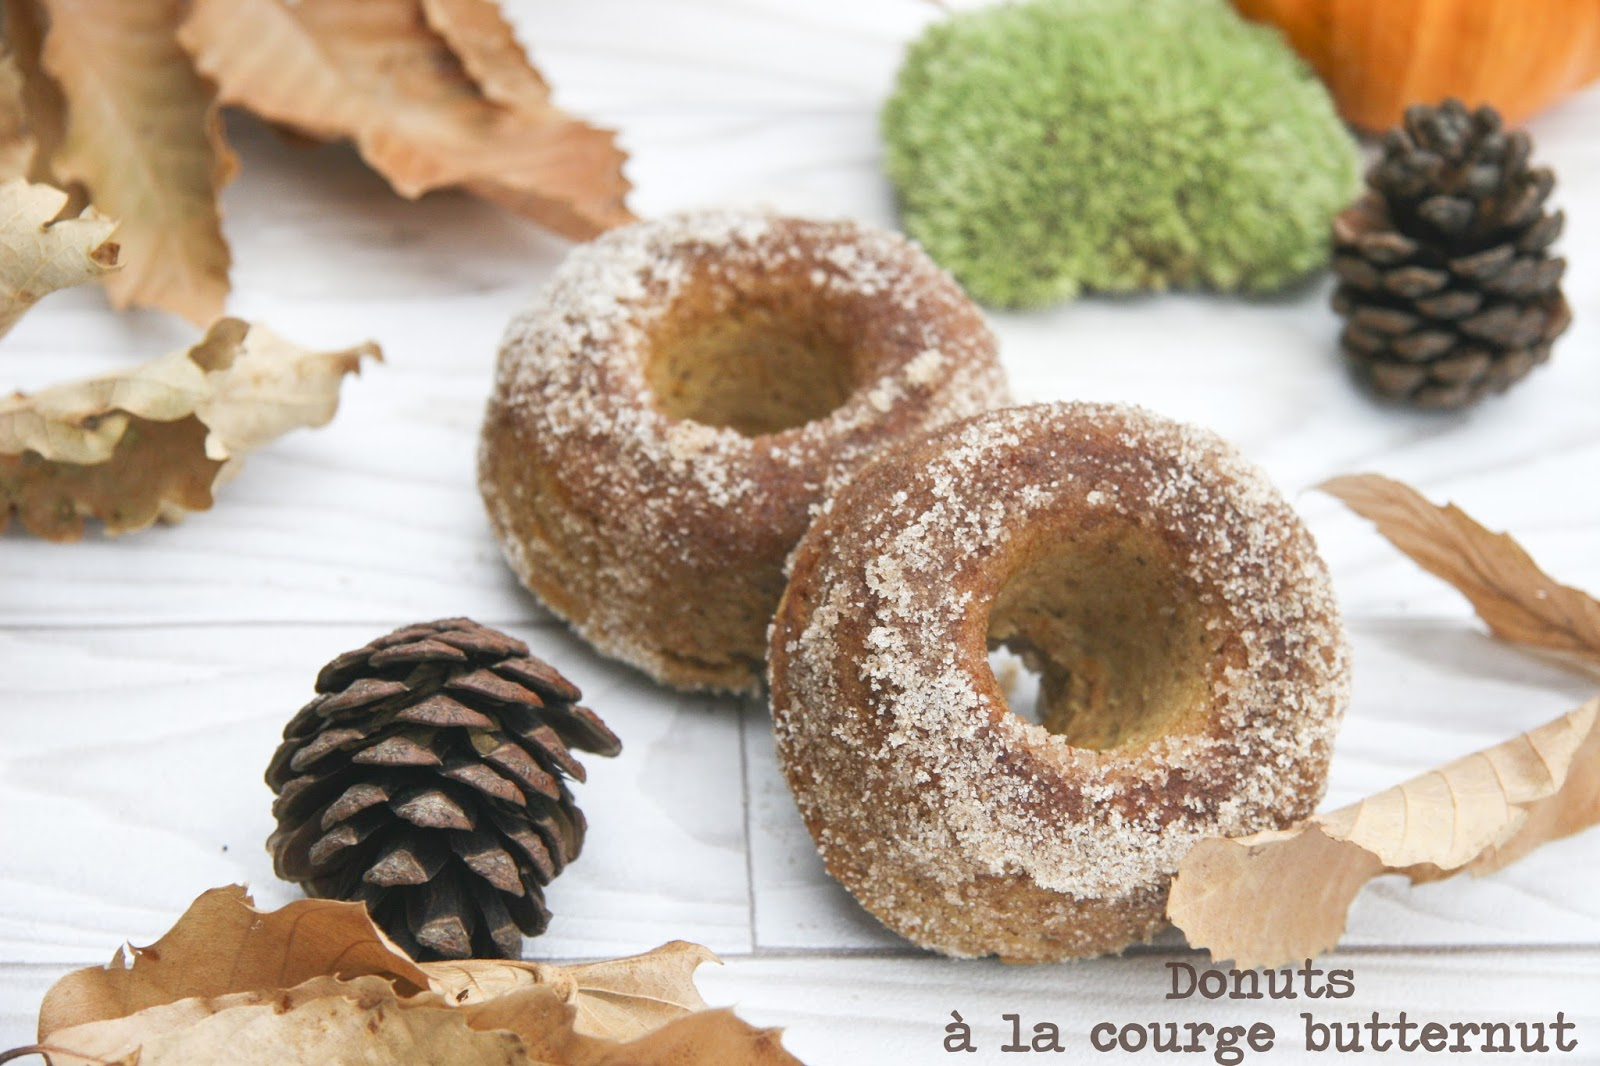 donuts la courge butternut cuits au four. Black Bedroom Furniture Sets. Home Design Ideas